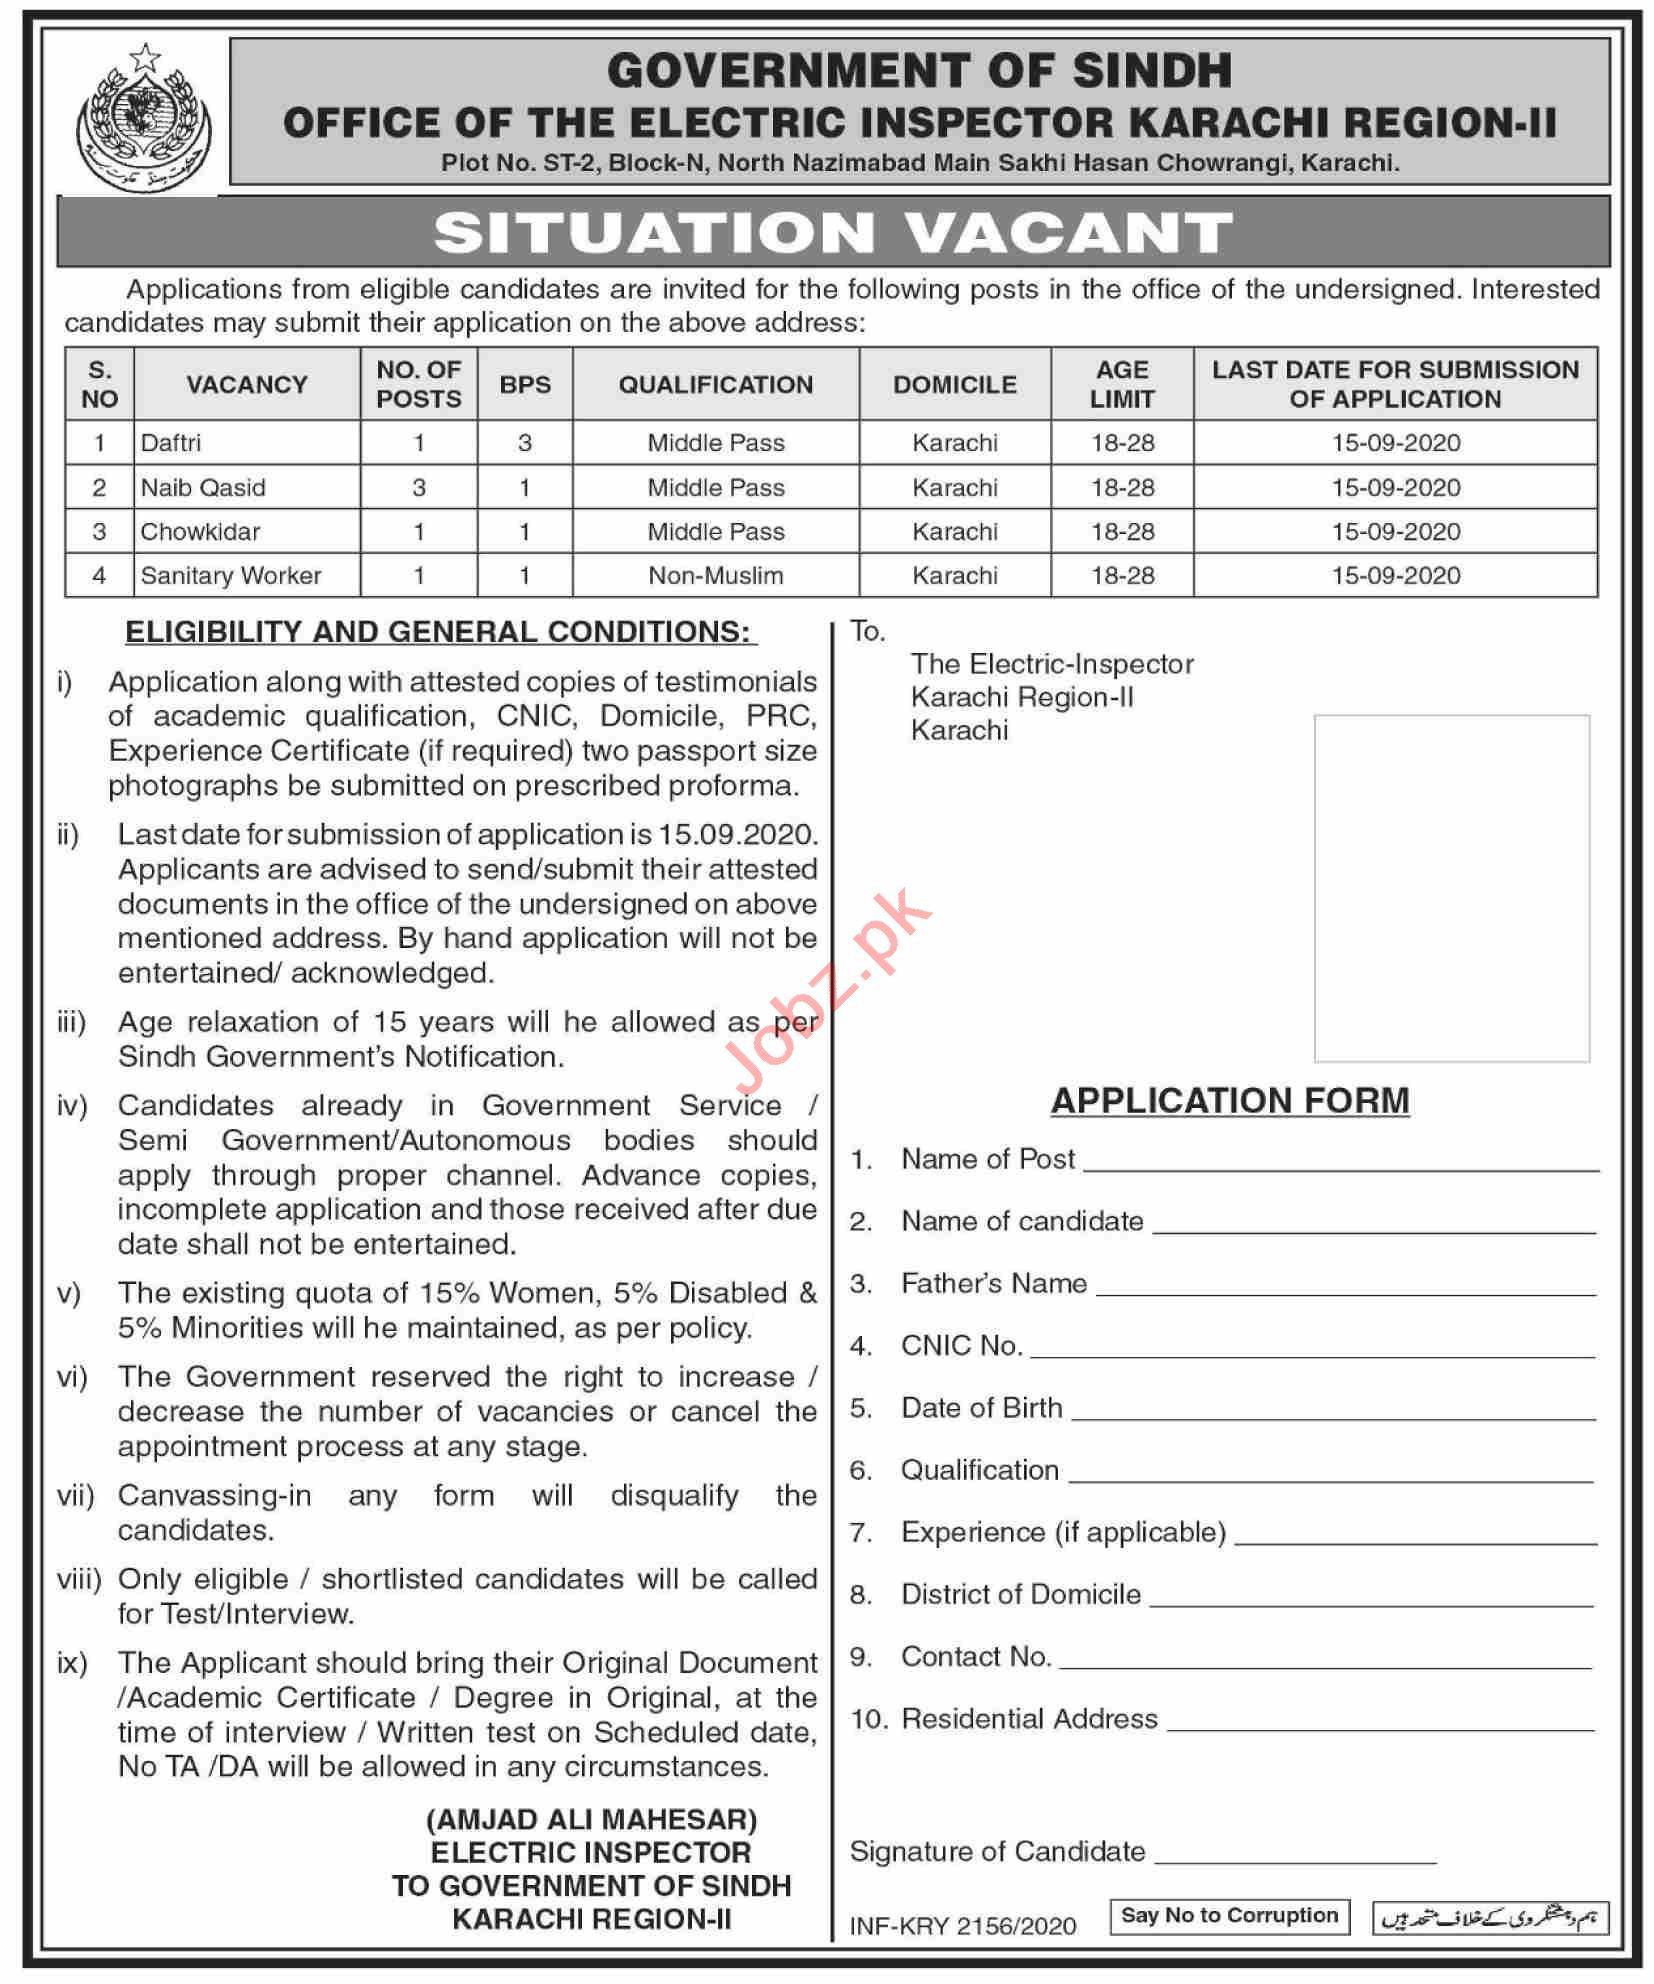 Electric Inspector Karachi Region Jobs 2020 for Naib Qasid